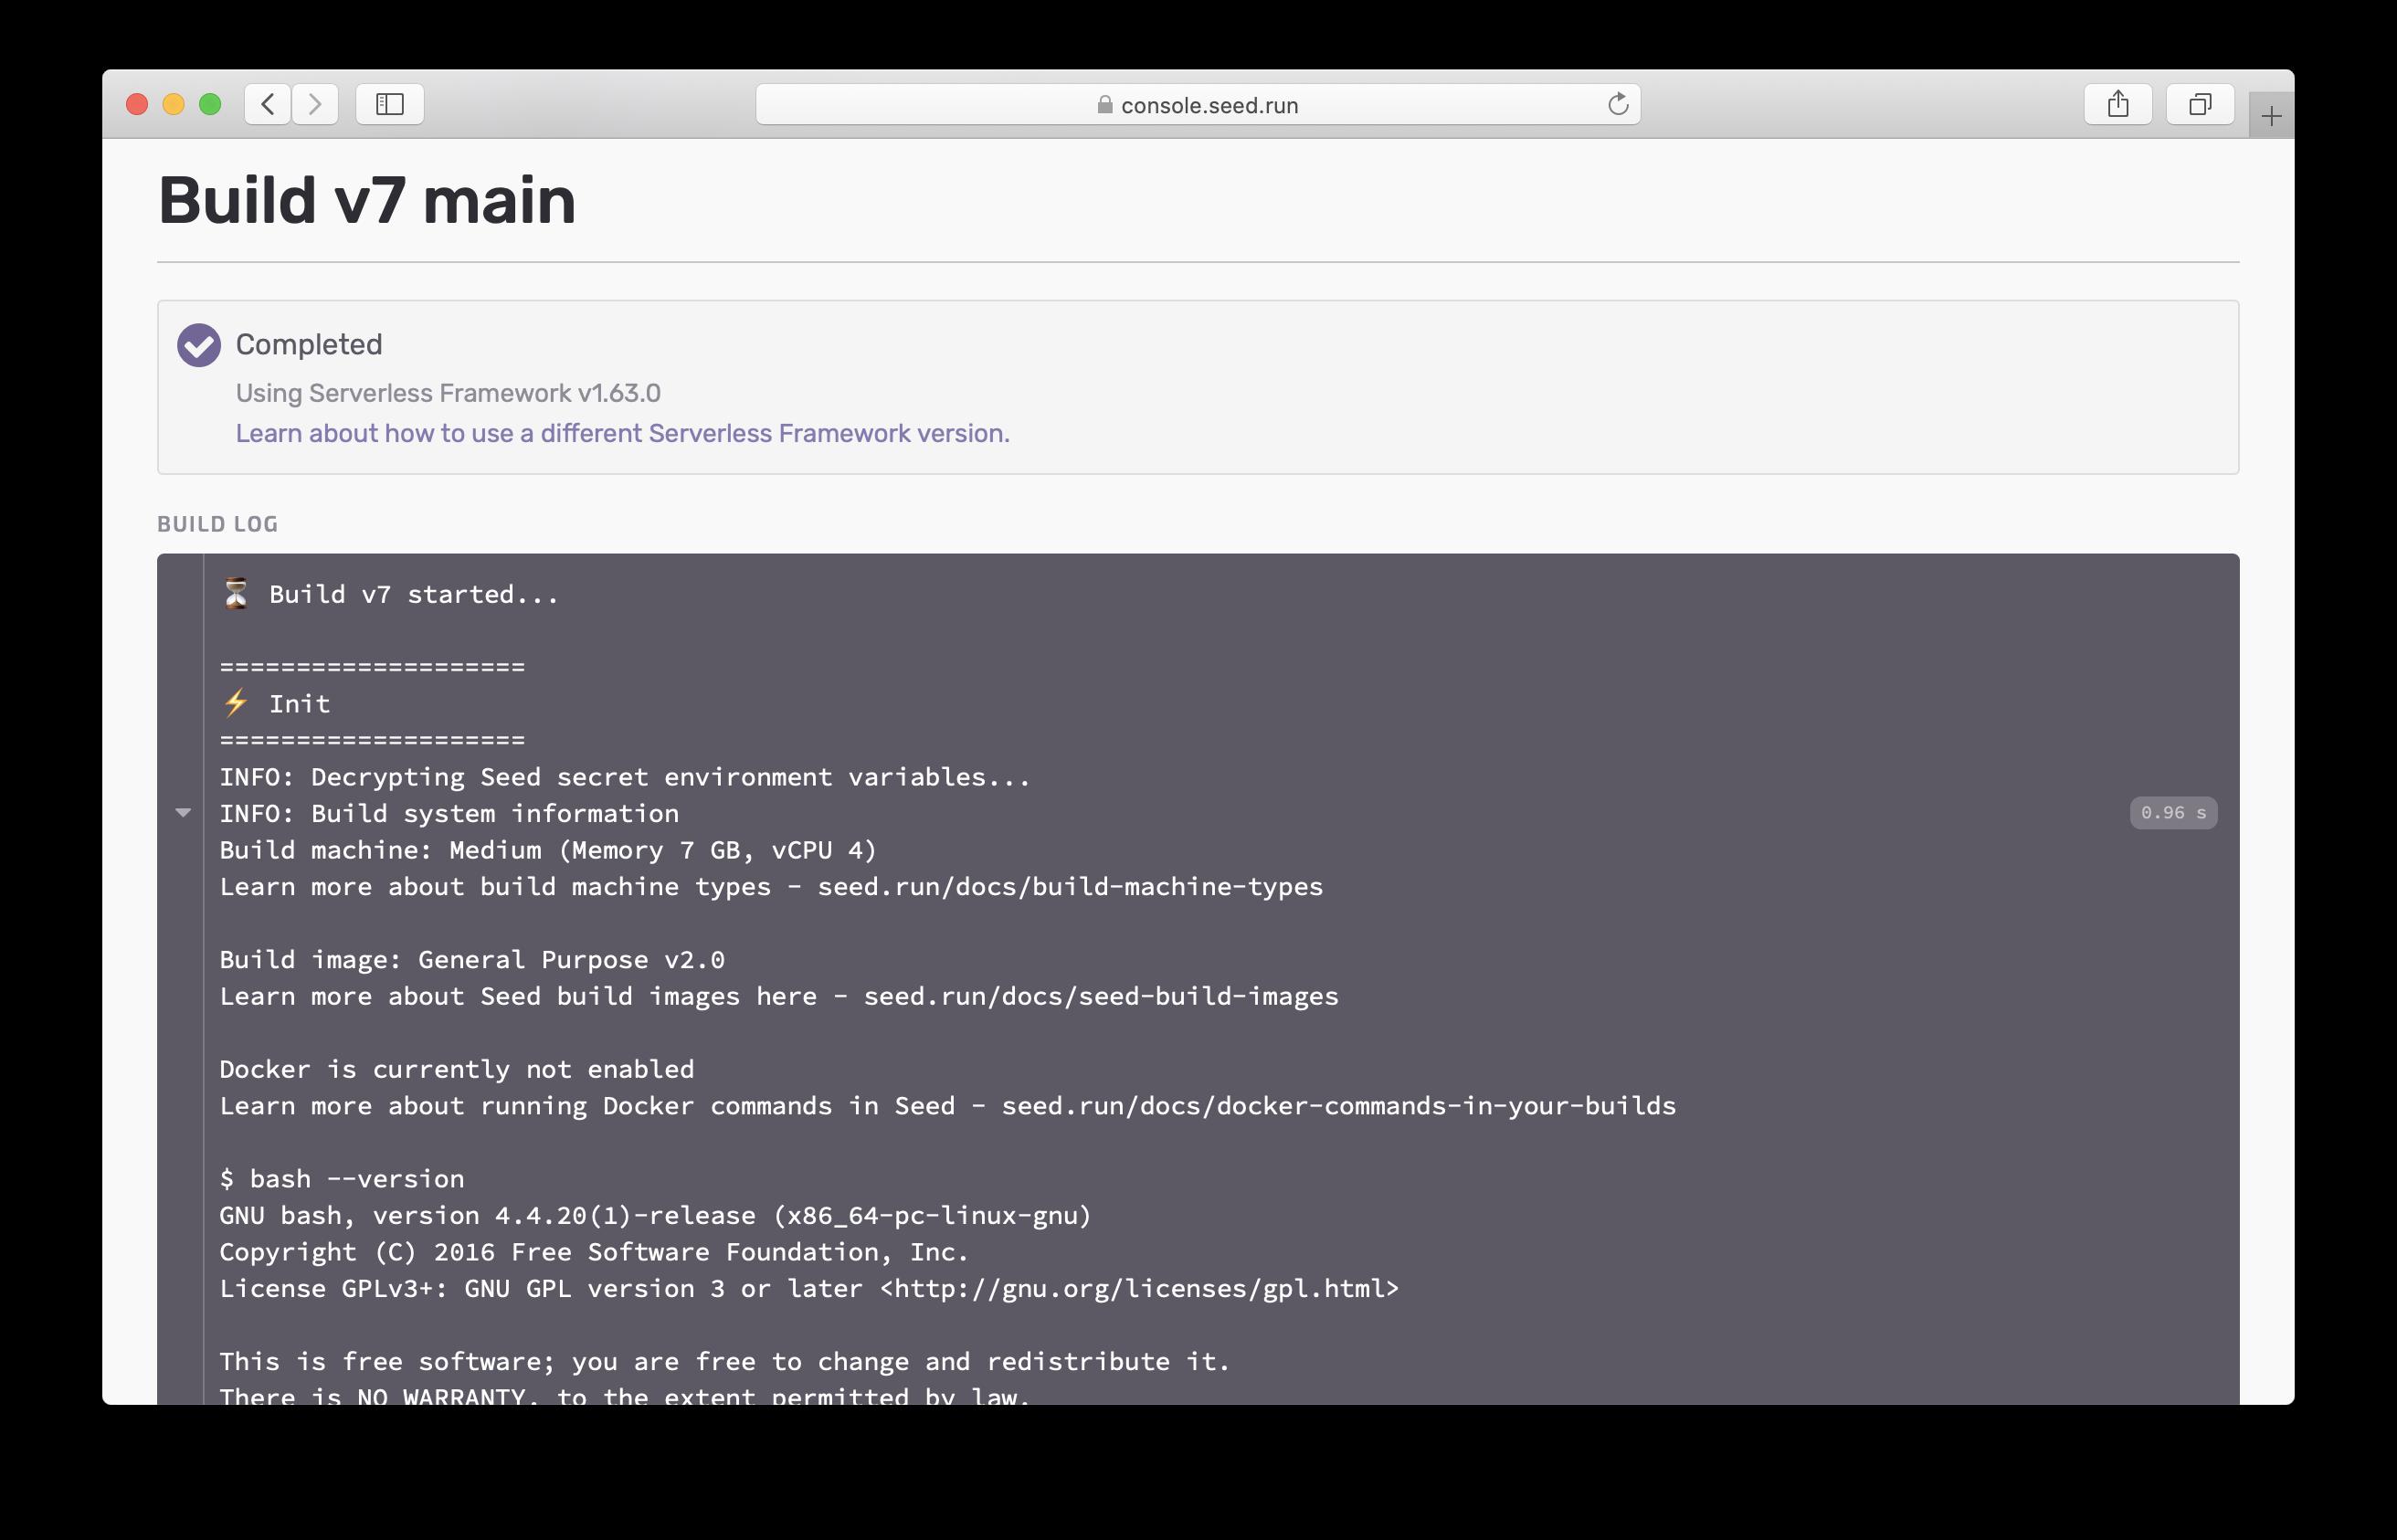 Build image info in build logs